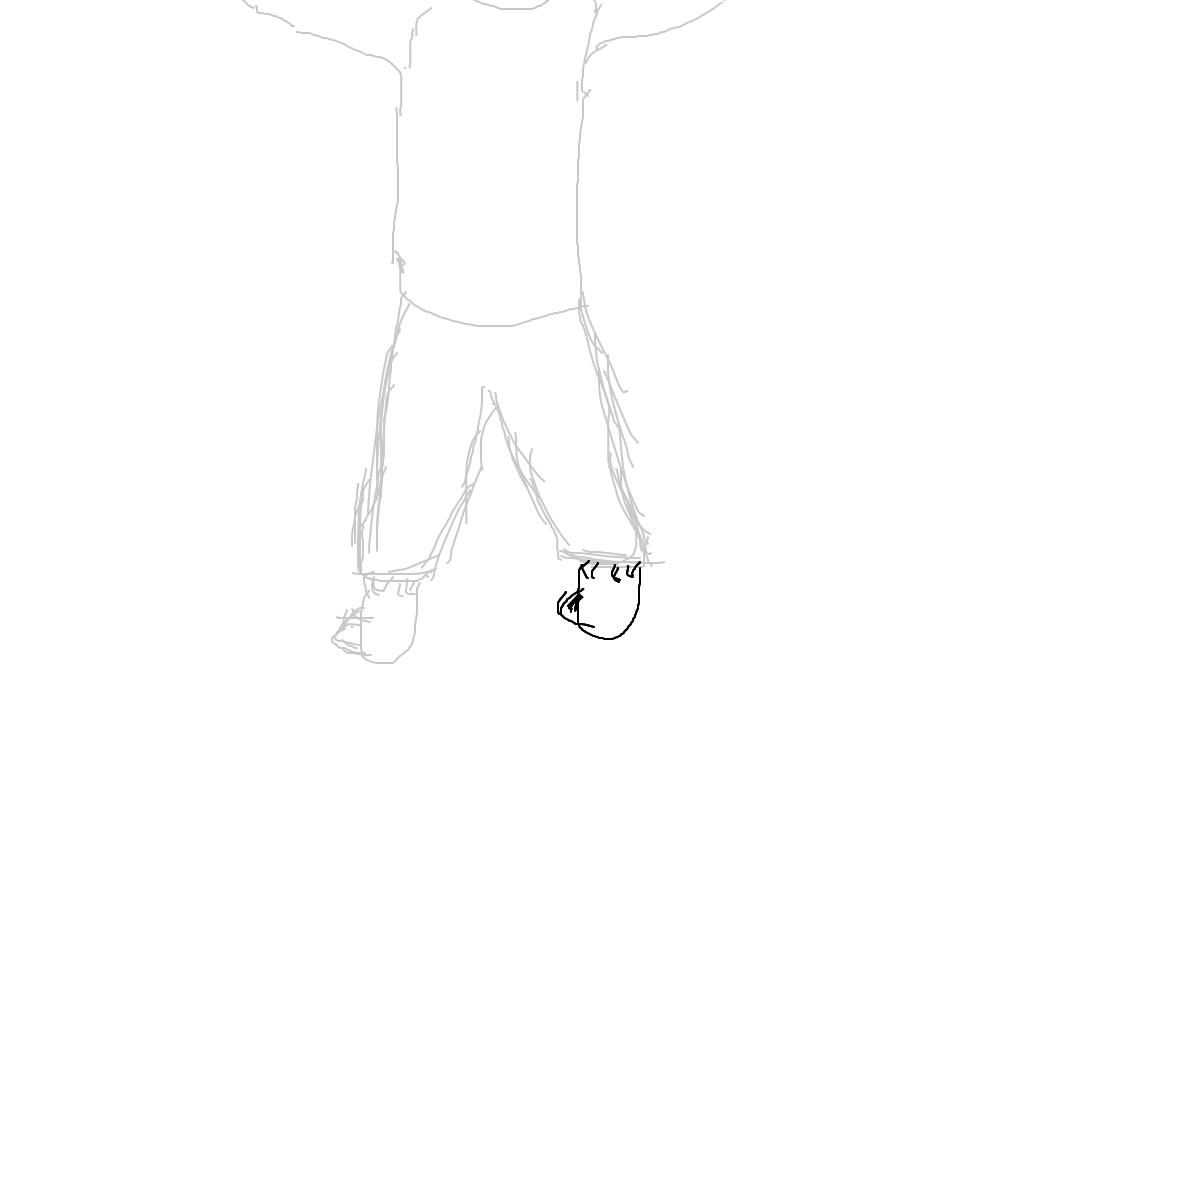 BAAAM drawing#5271 lat:39.9655761718750000lng: -75.1809082031250000